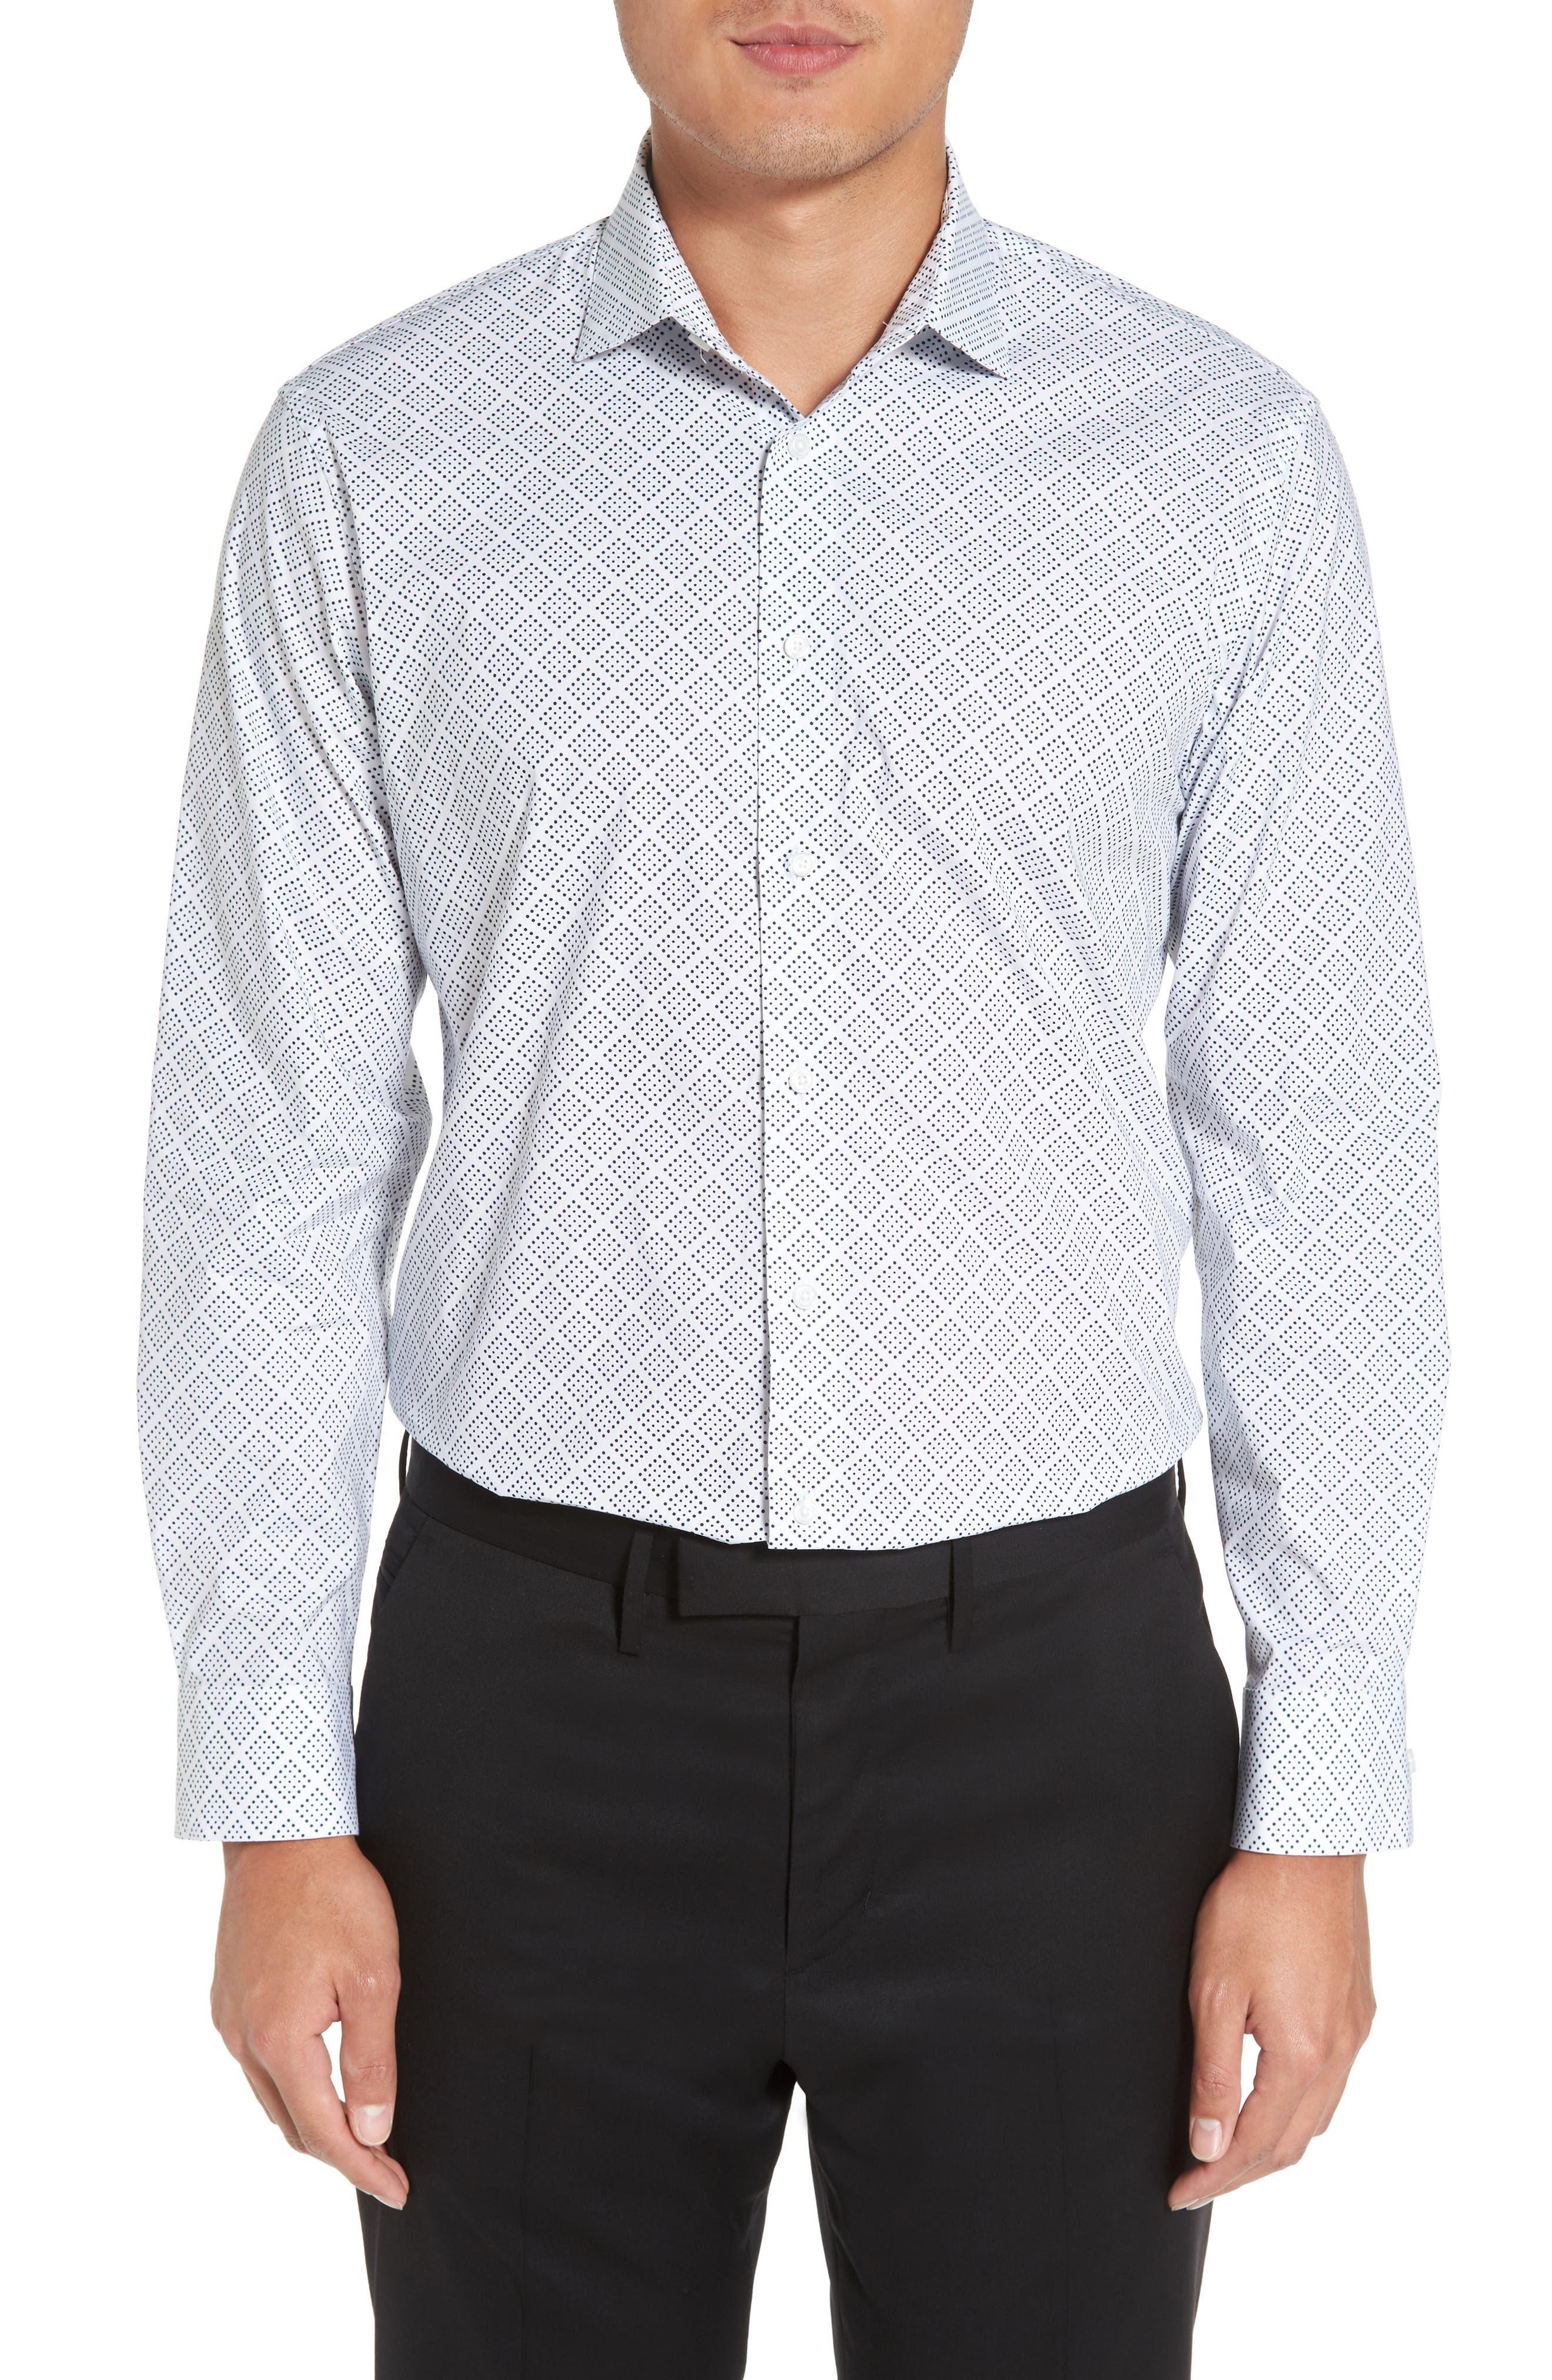 Trim Fit Non-Iron Graphic Stretch Dress Shirt,                             Main thumbnail 1, color,                             410